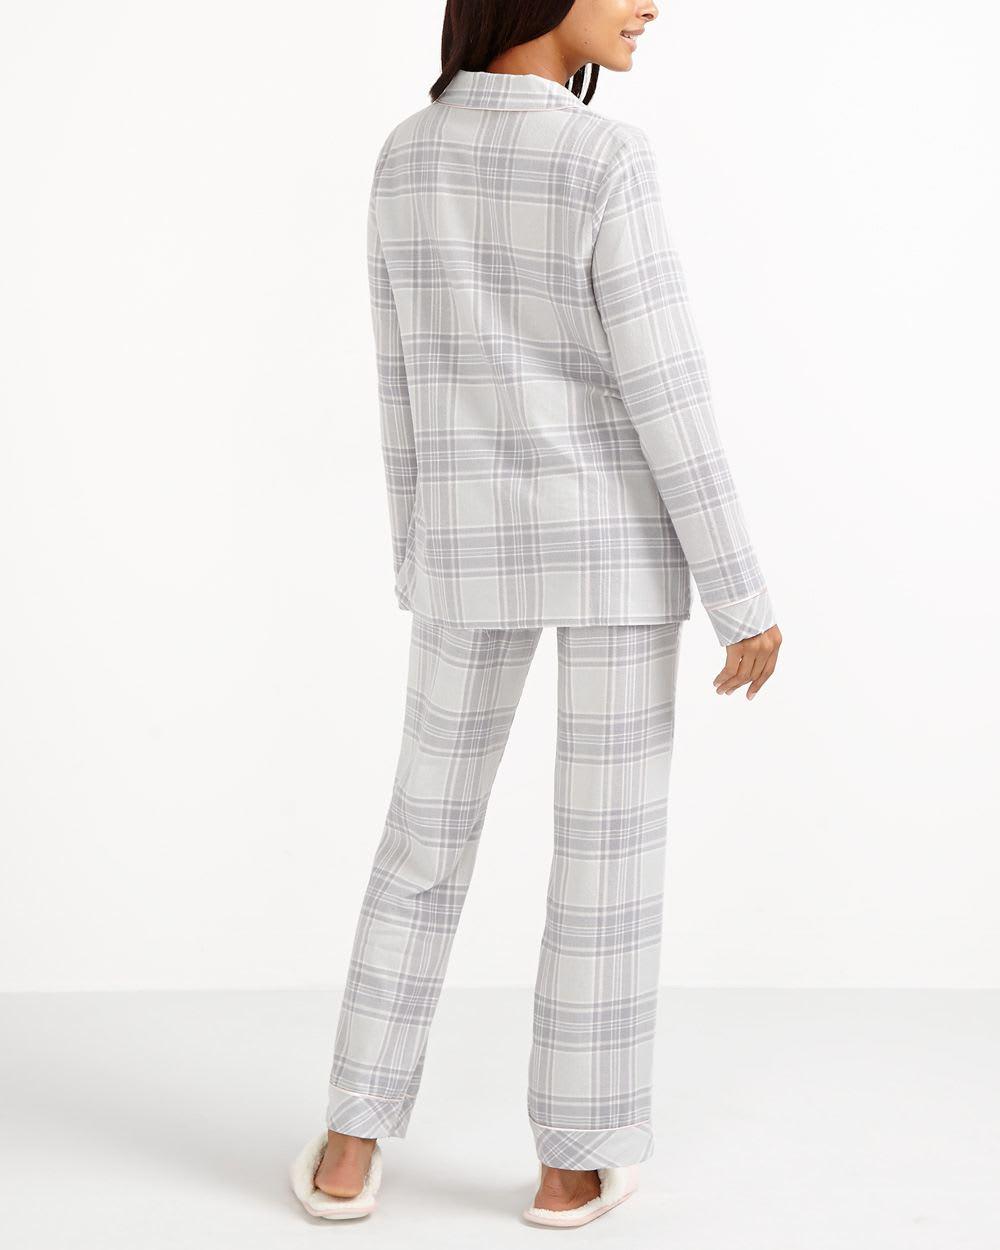 Ensemble pyjama carreaux deluxe femmes reitmans for Pyjama a carreaux